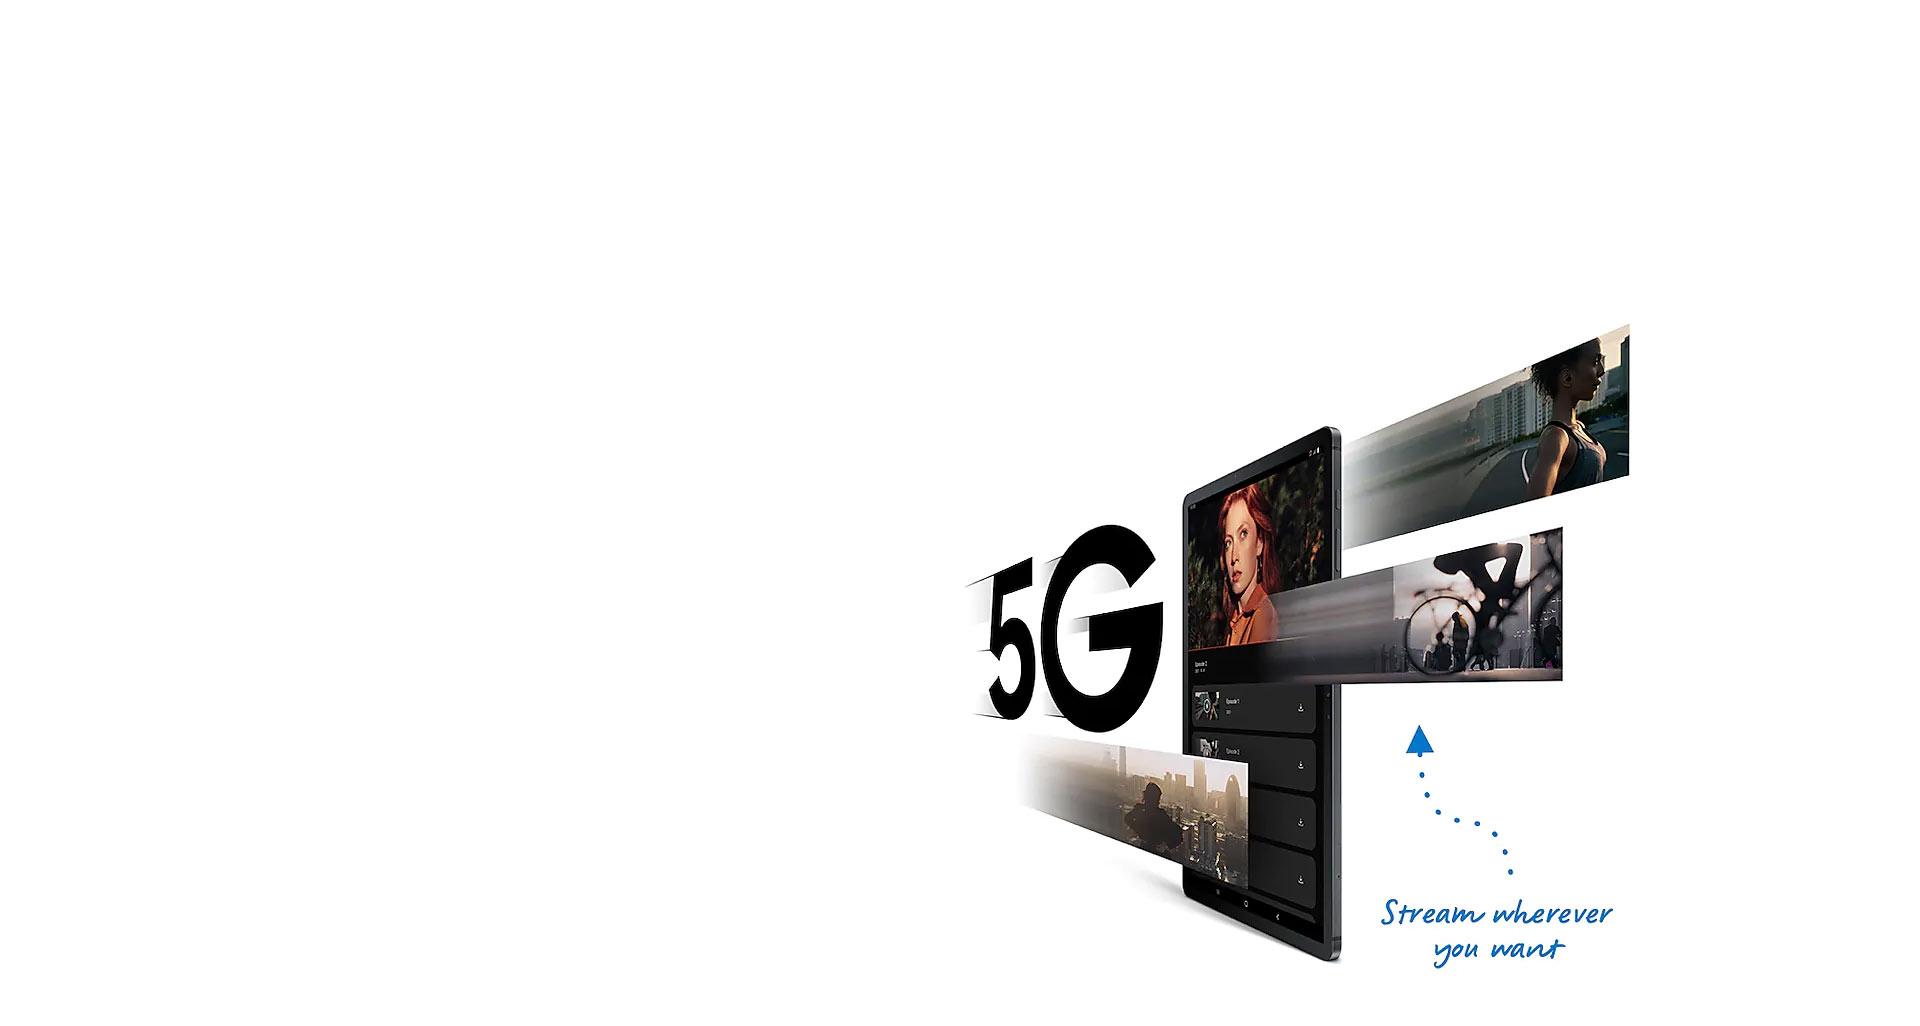 تبلت تب اس 7 اف ایی 5G